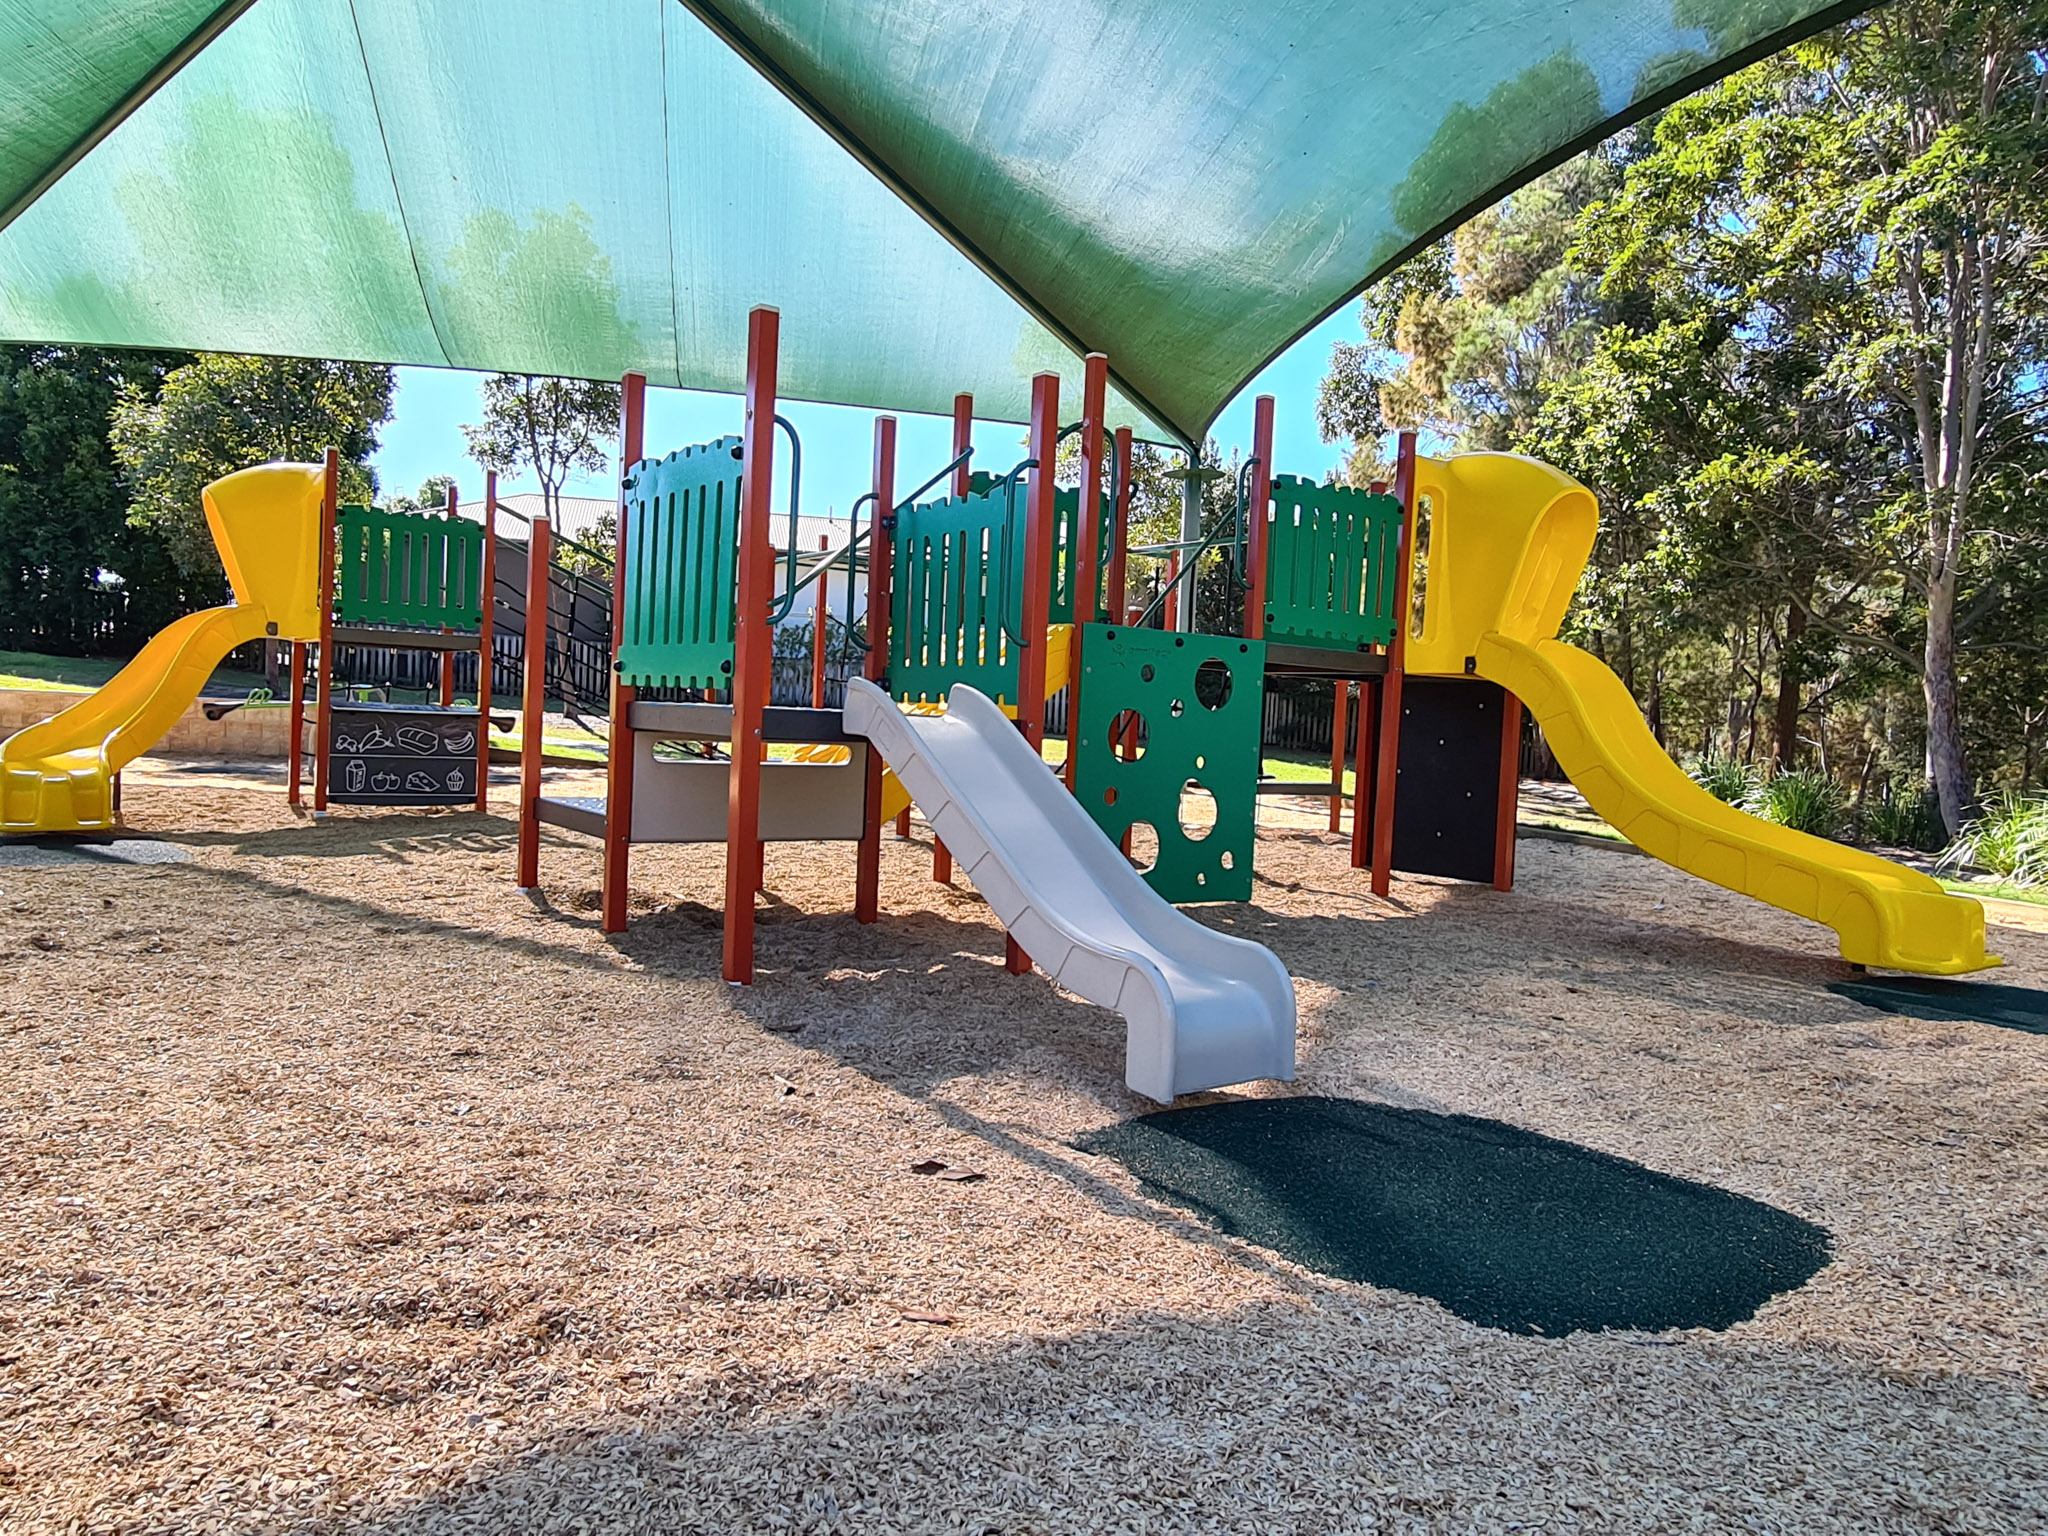 palm-beach-state-school-playrground-austek-play-52